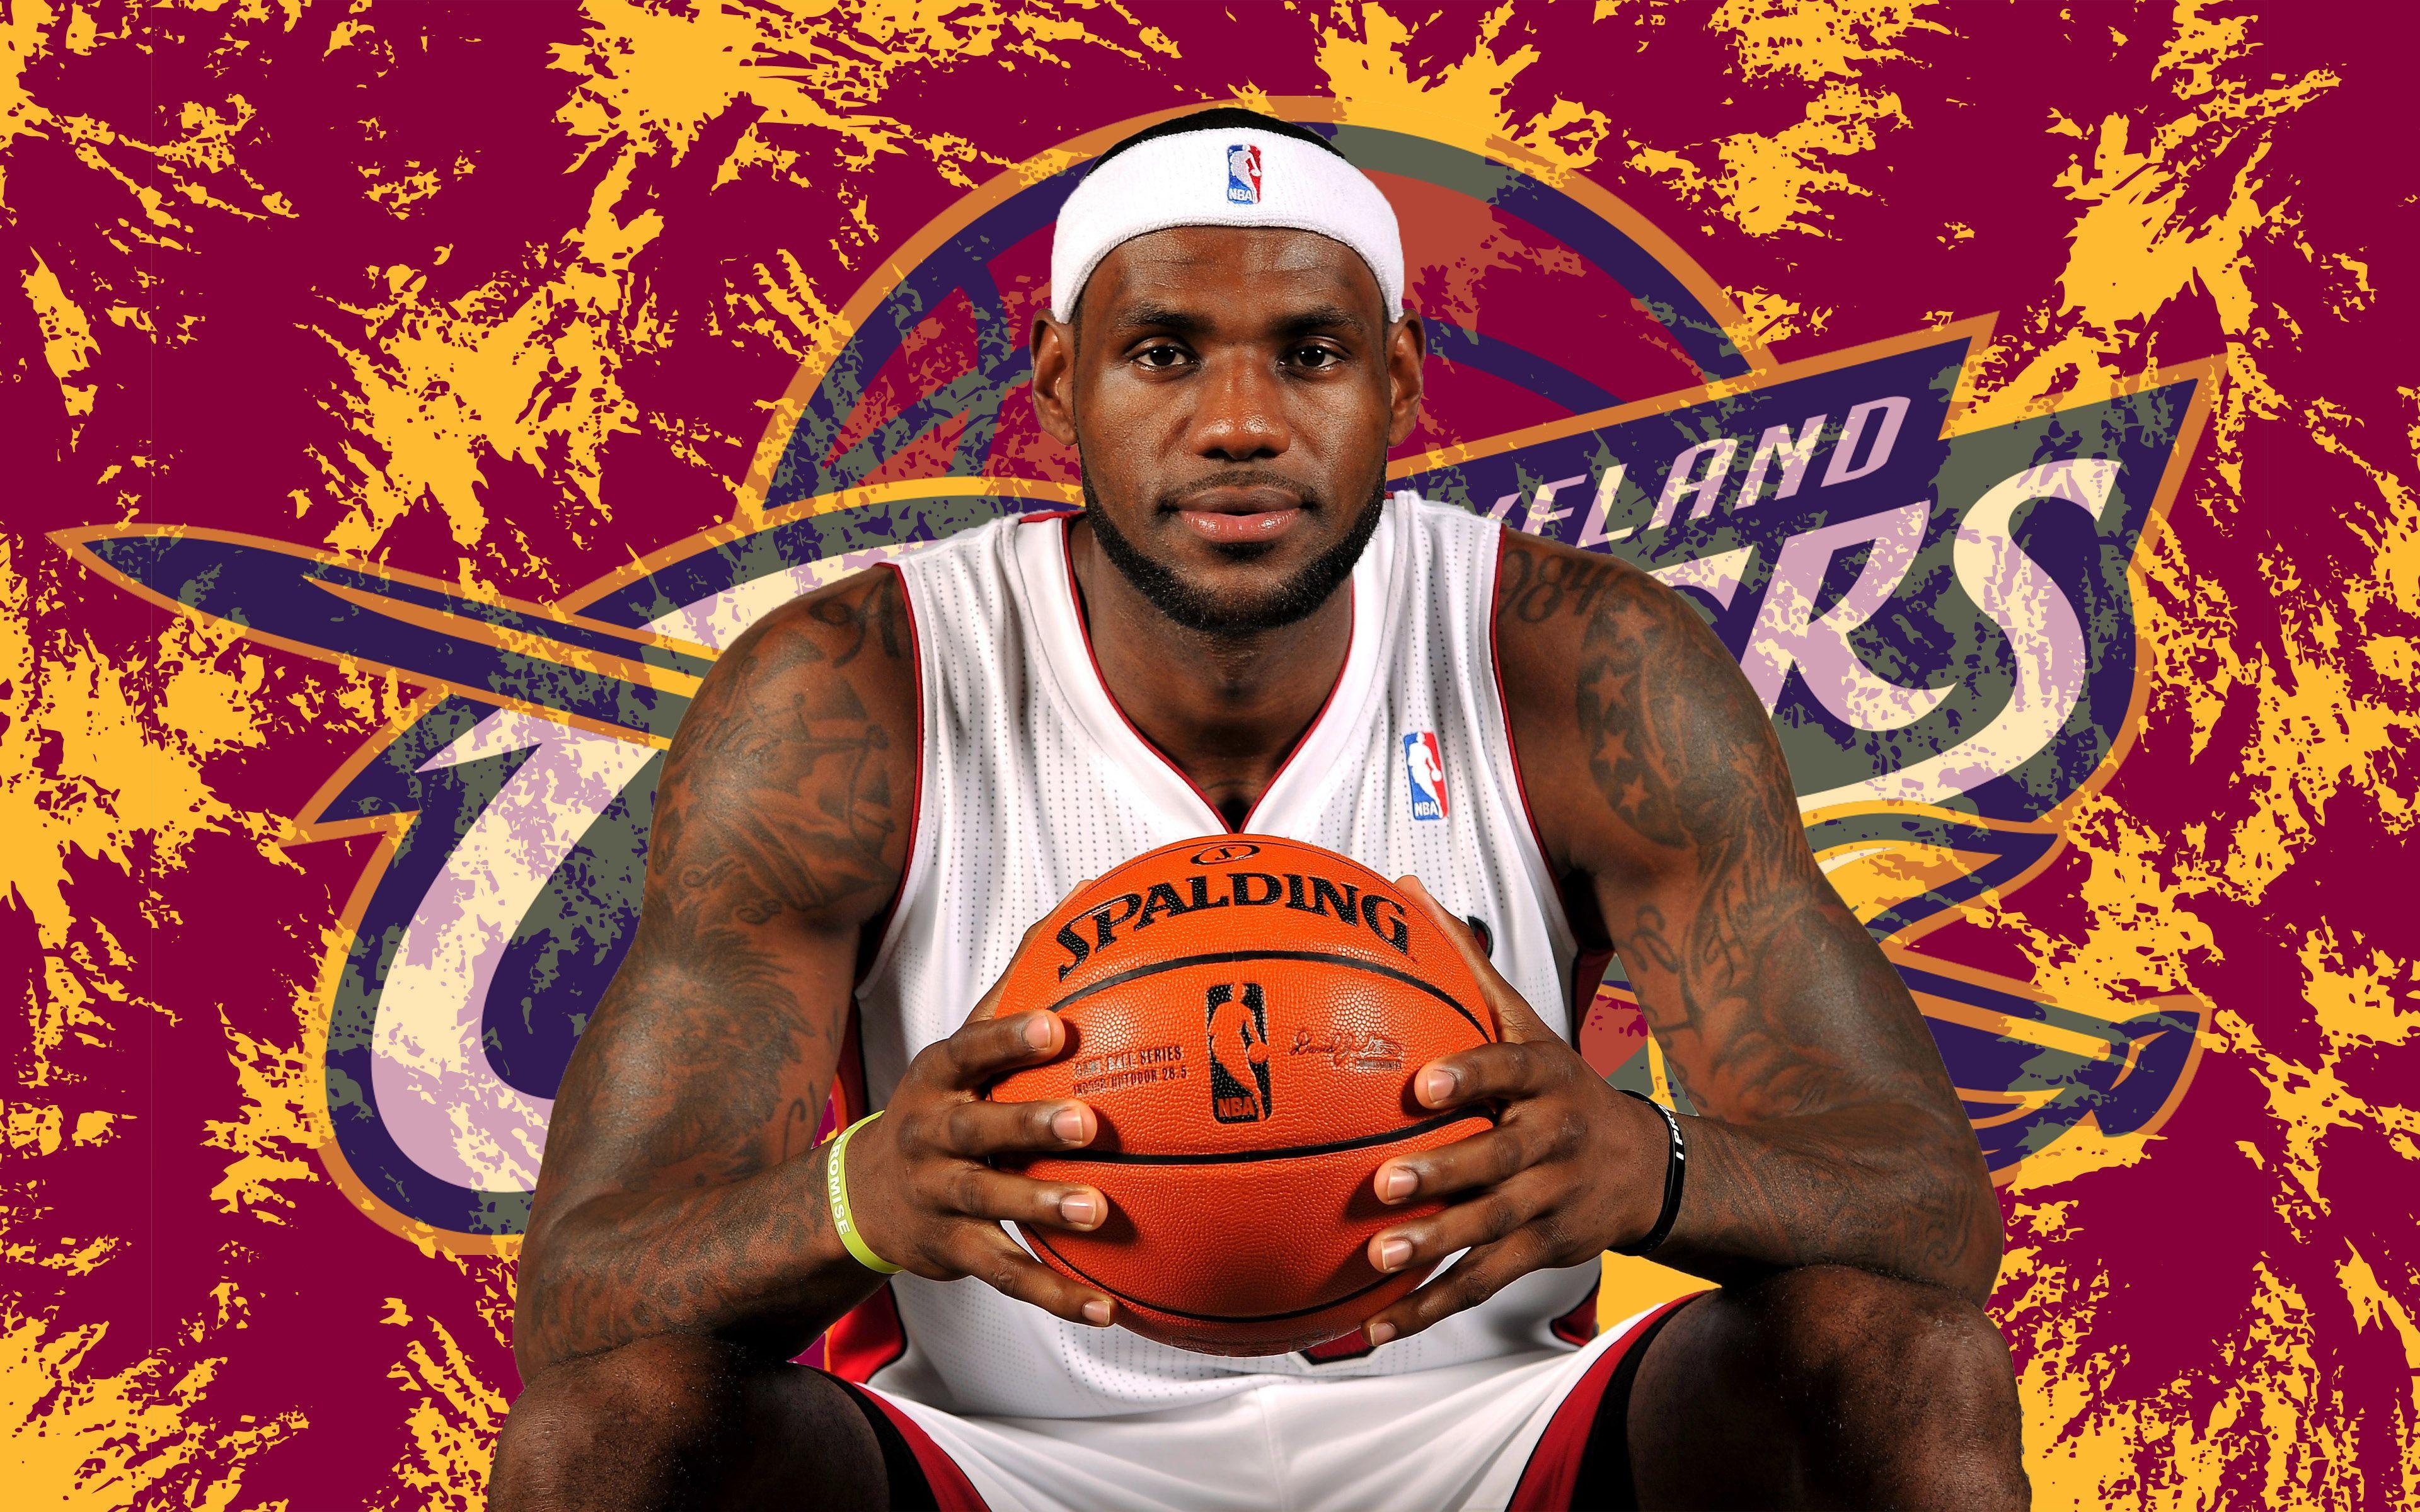 LeBron James Cleveland Cavaliers LeBron James 2014